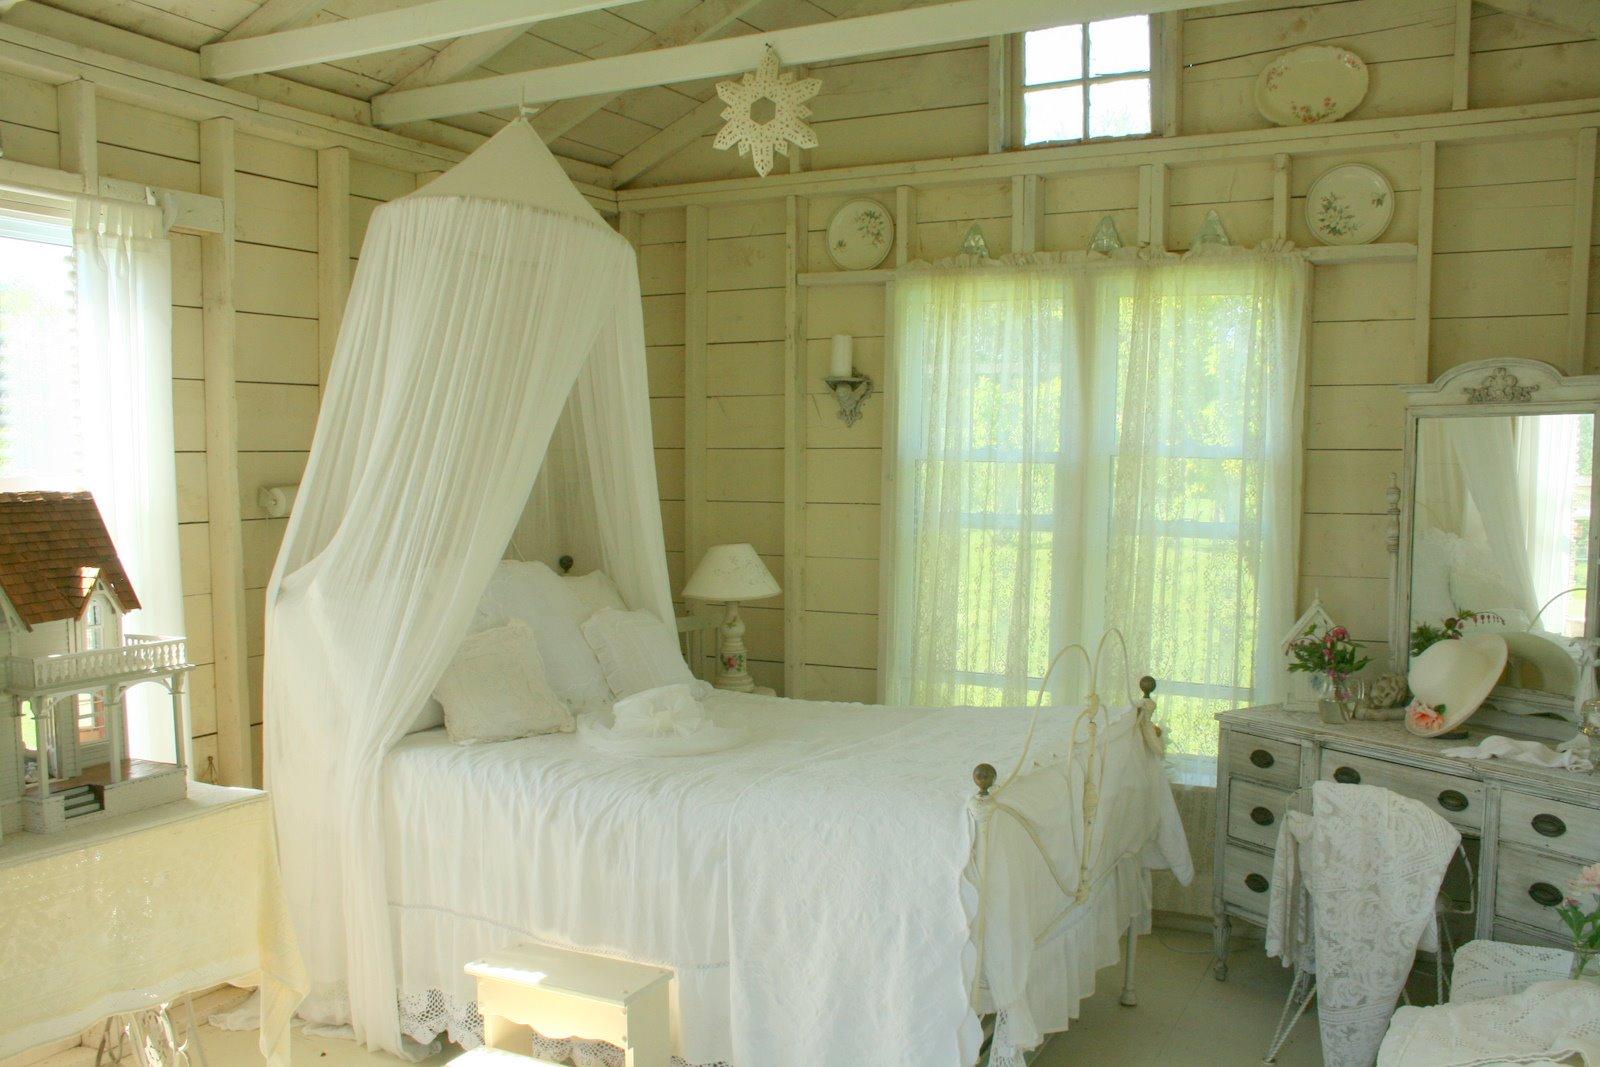 Paradis express aiken house gardens - Decoratie de charme chic ...